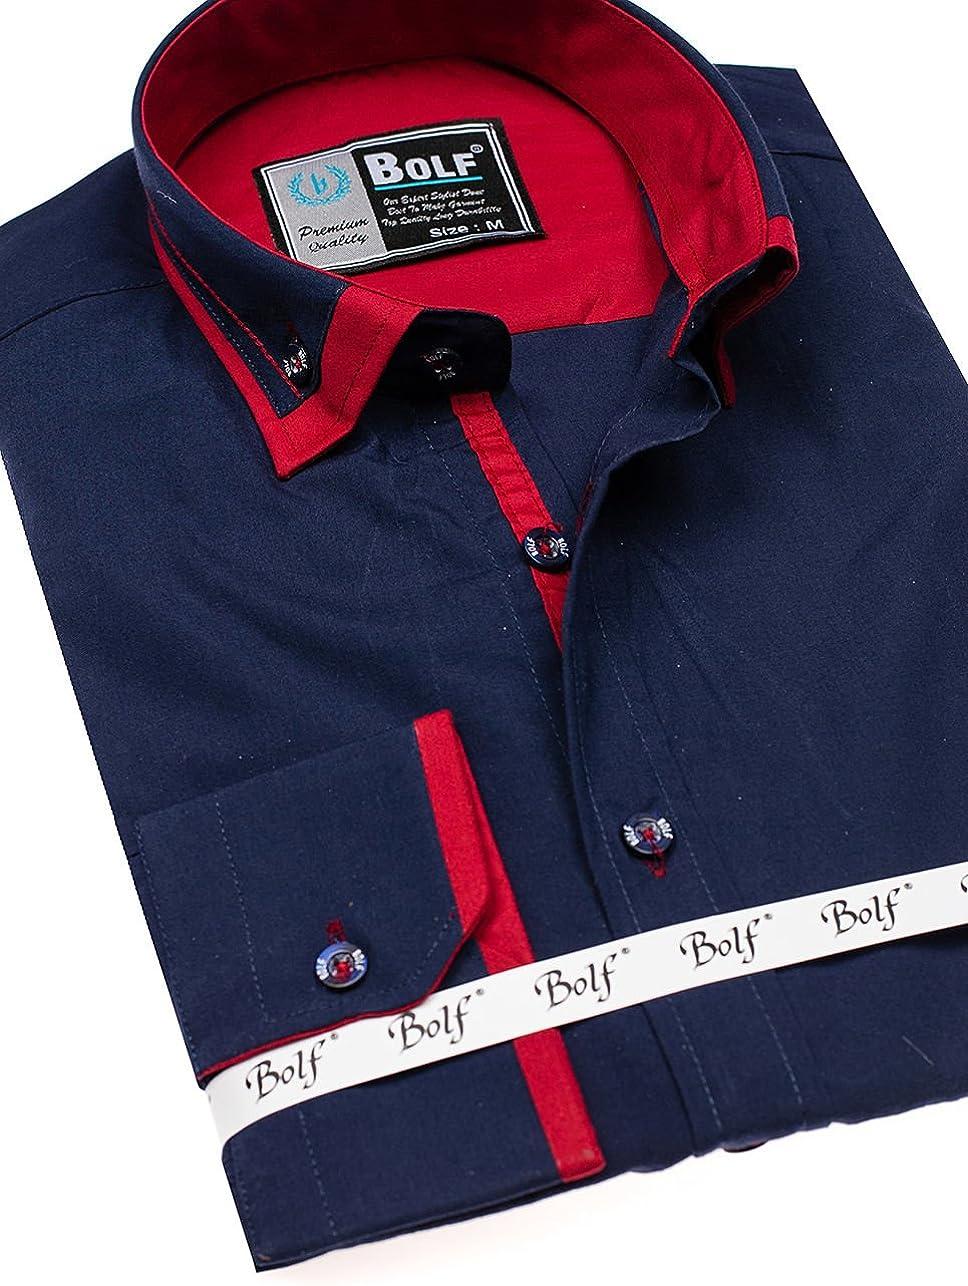 BOLF - Camisa Formal - Manga Larga - para Hombre Azul Oscuro S: Amazon.es: Ropa y accesorios